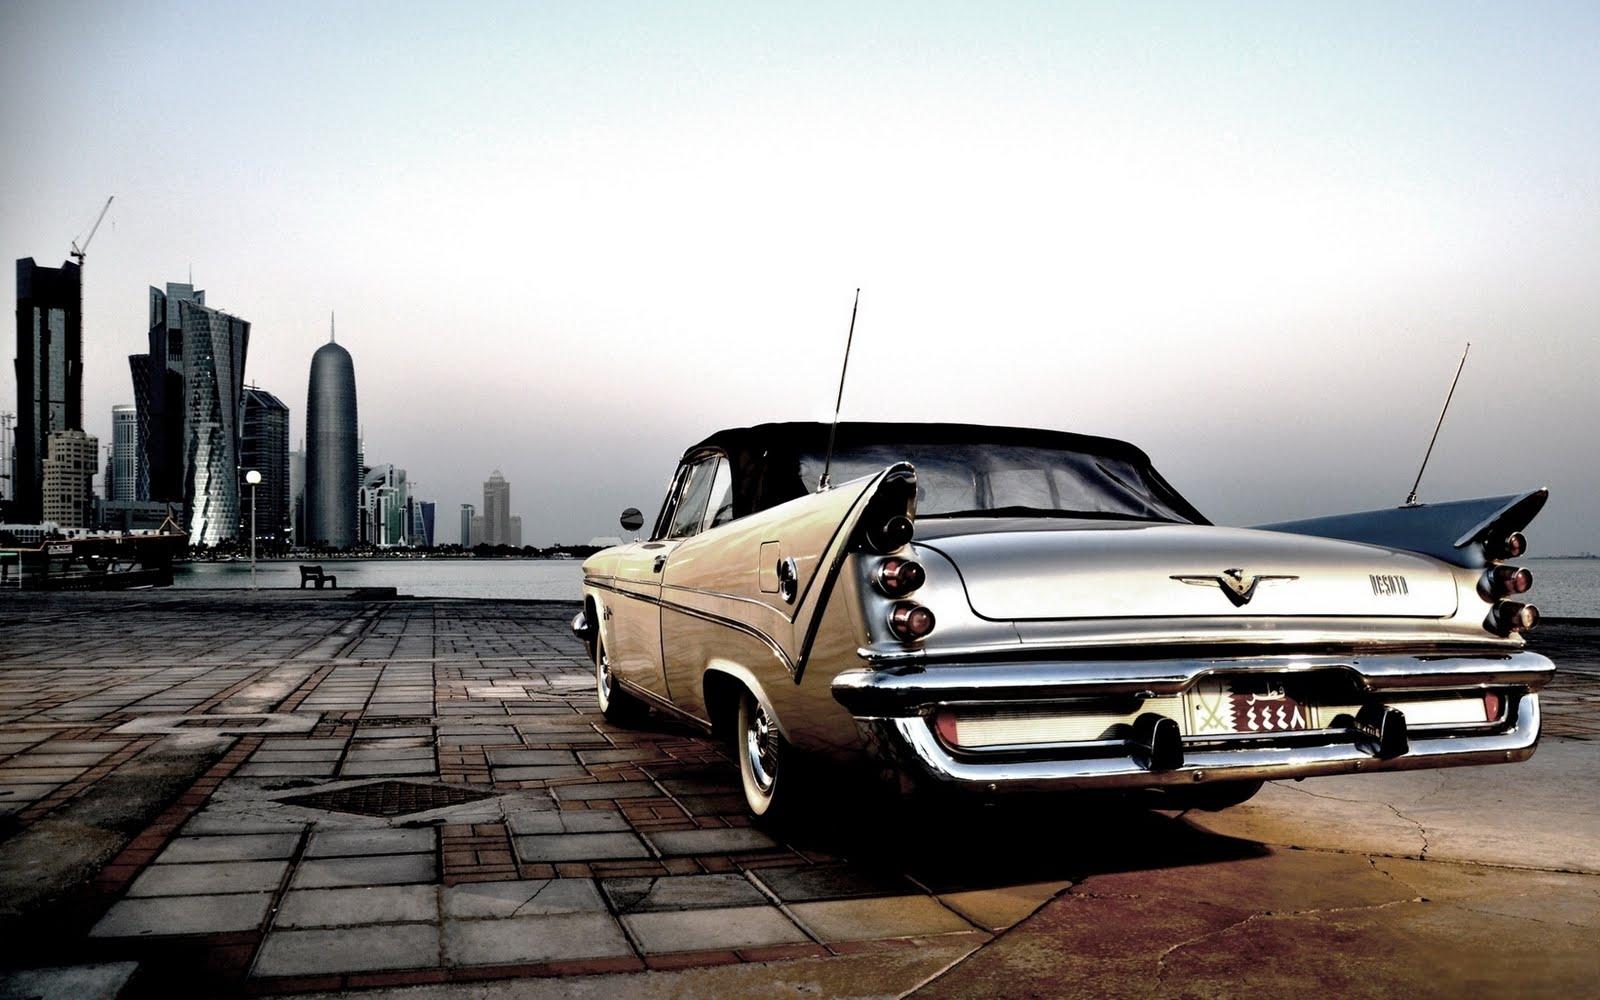 Chrysler Desoto City Old Car Photo HD Wallpaper Wallpaper